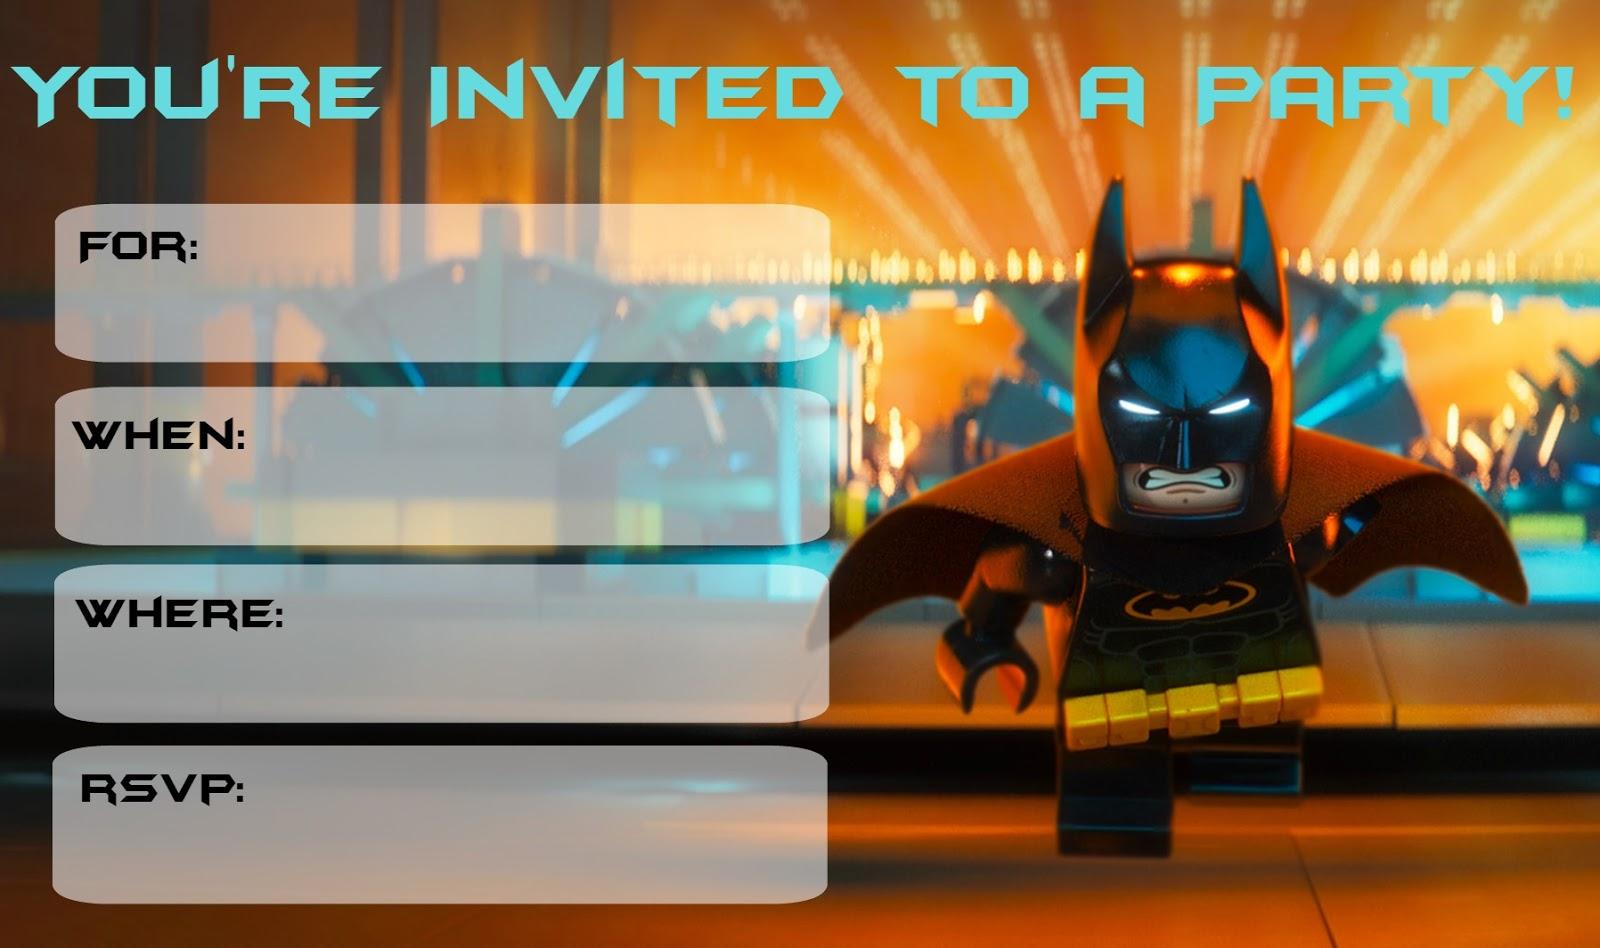 Lego Batman Binvitation Superb Lego Batman Party Invitations Free - Lego Batman Invitations Free Printable